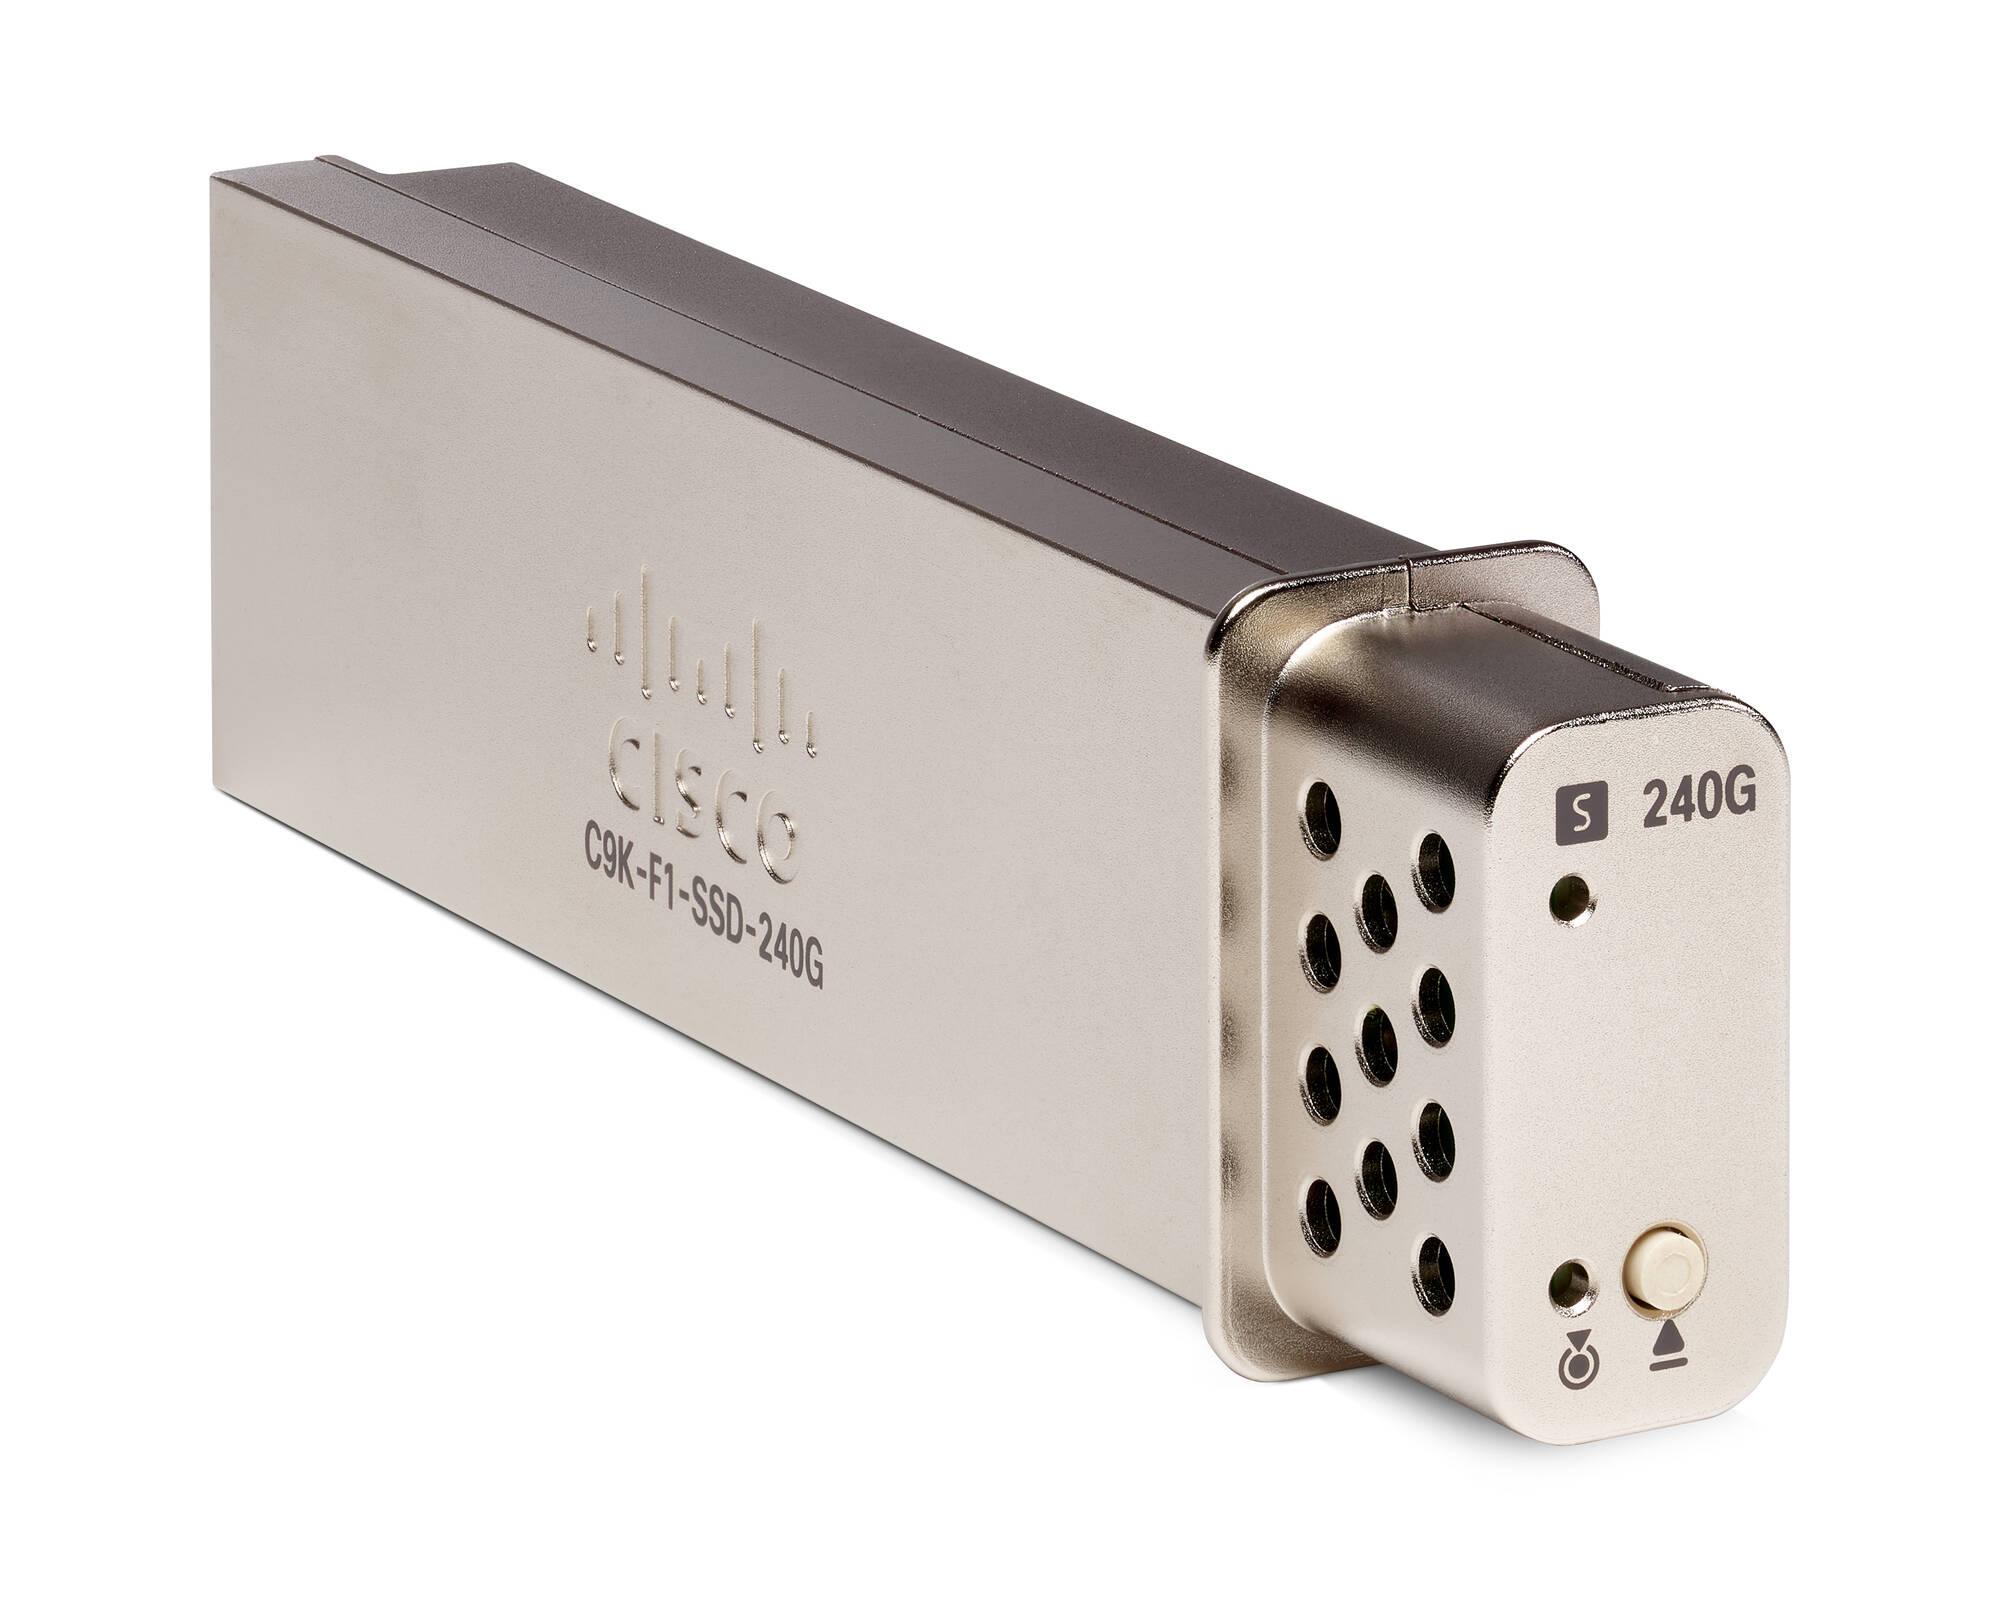 C9K-F2-SSD-240GB=  C9K-F2-SSD-240GB,Cisco Catalyst 9600 Series 240GB SSD Storage  思科9600系列交换机用 240GB固态硬盘